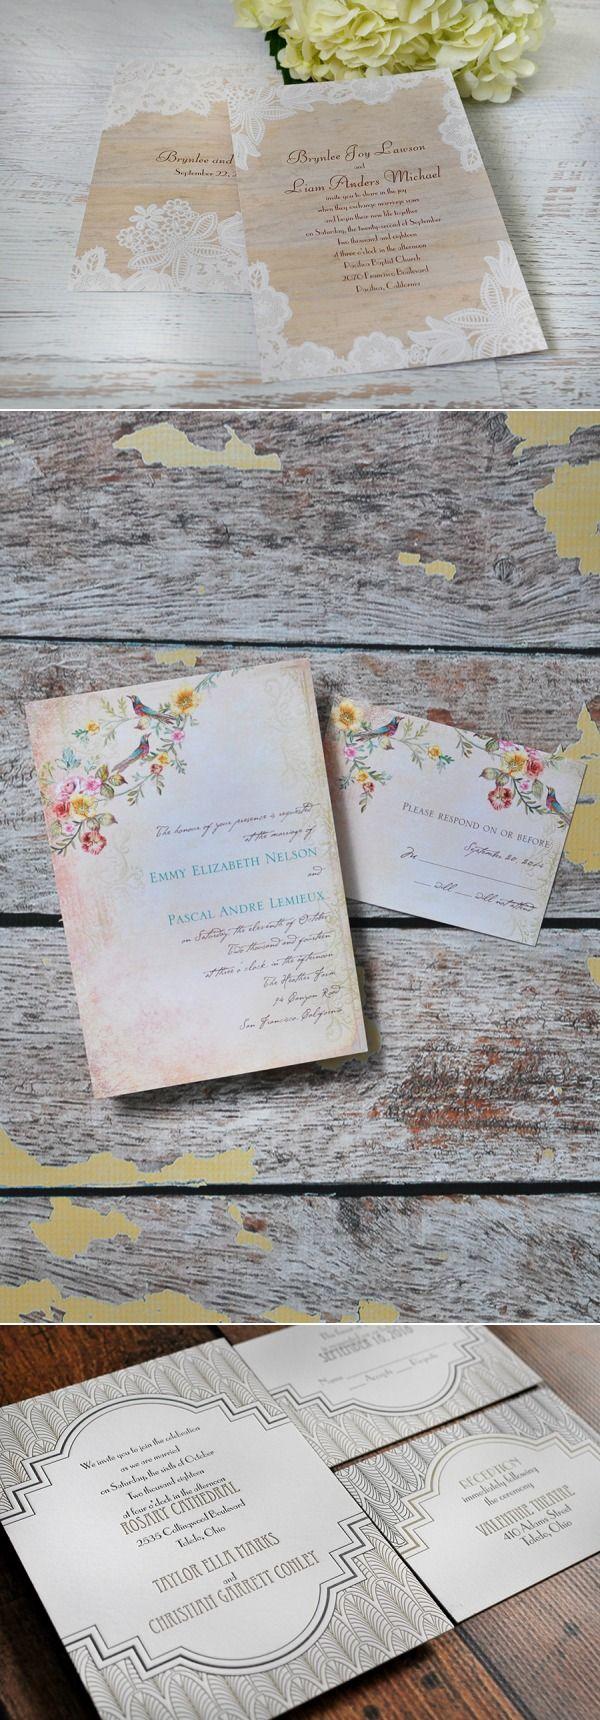 Invitations by Dawn + A Discount!